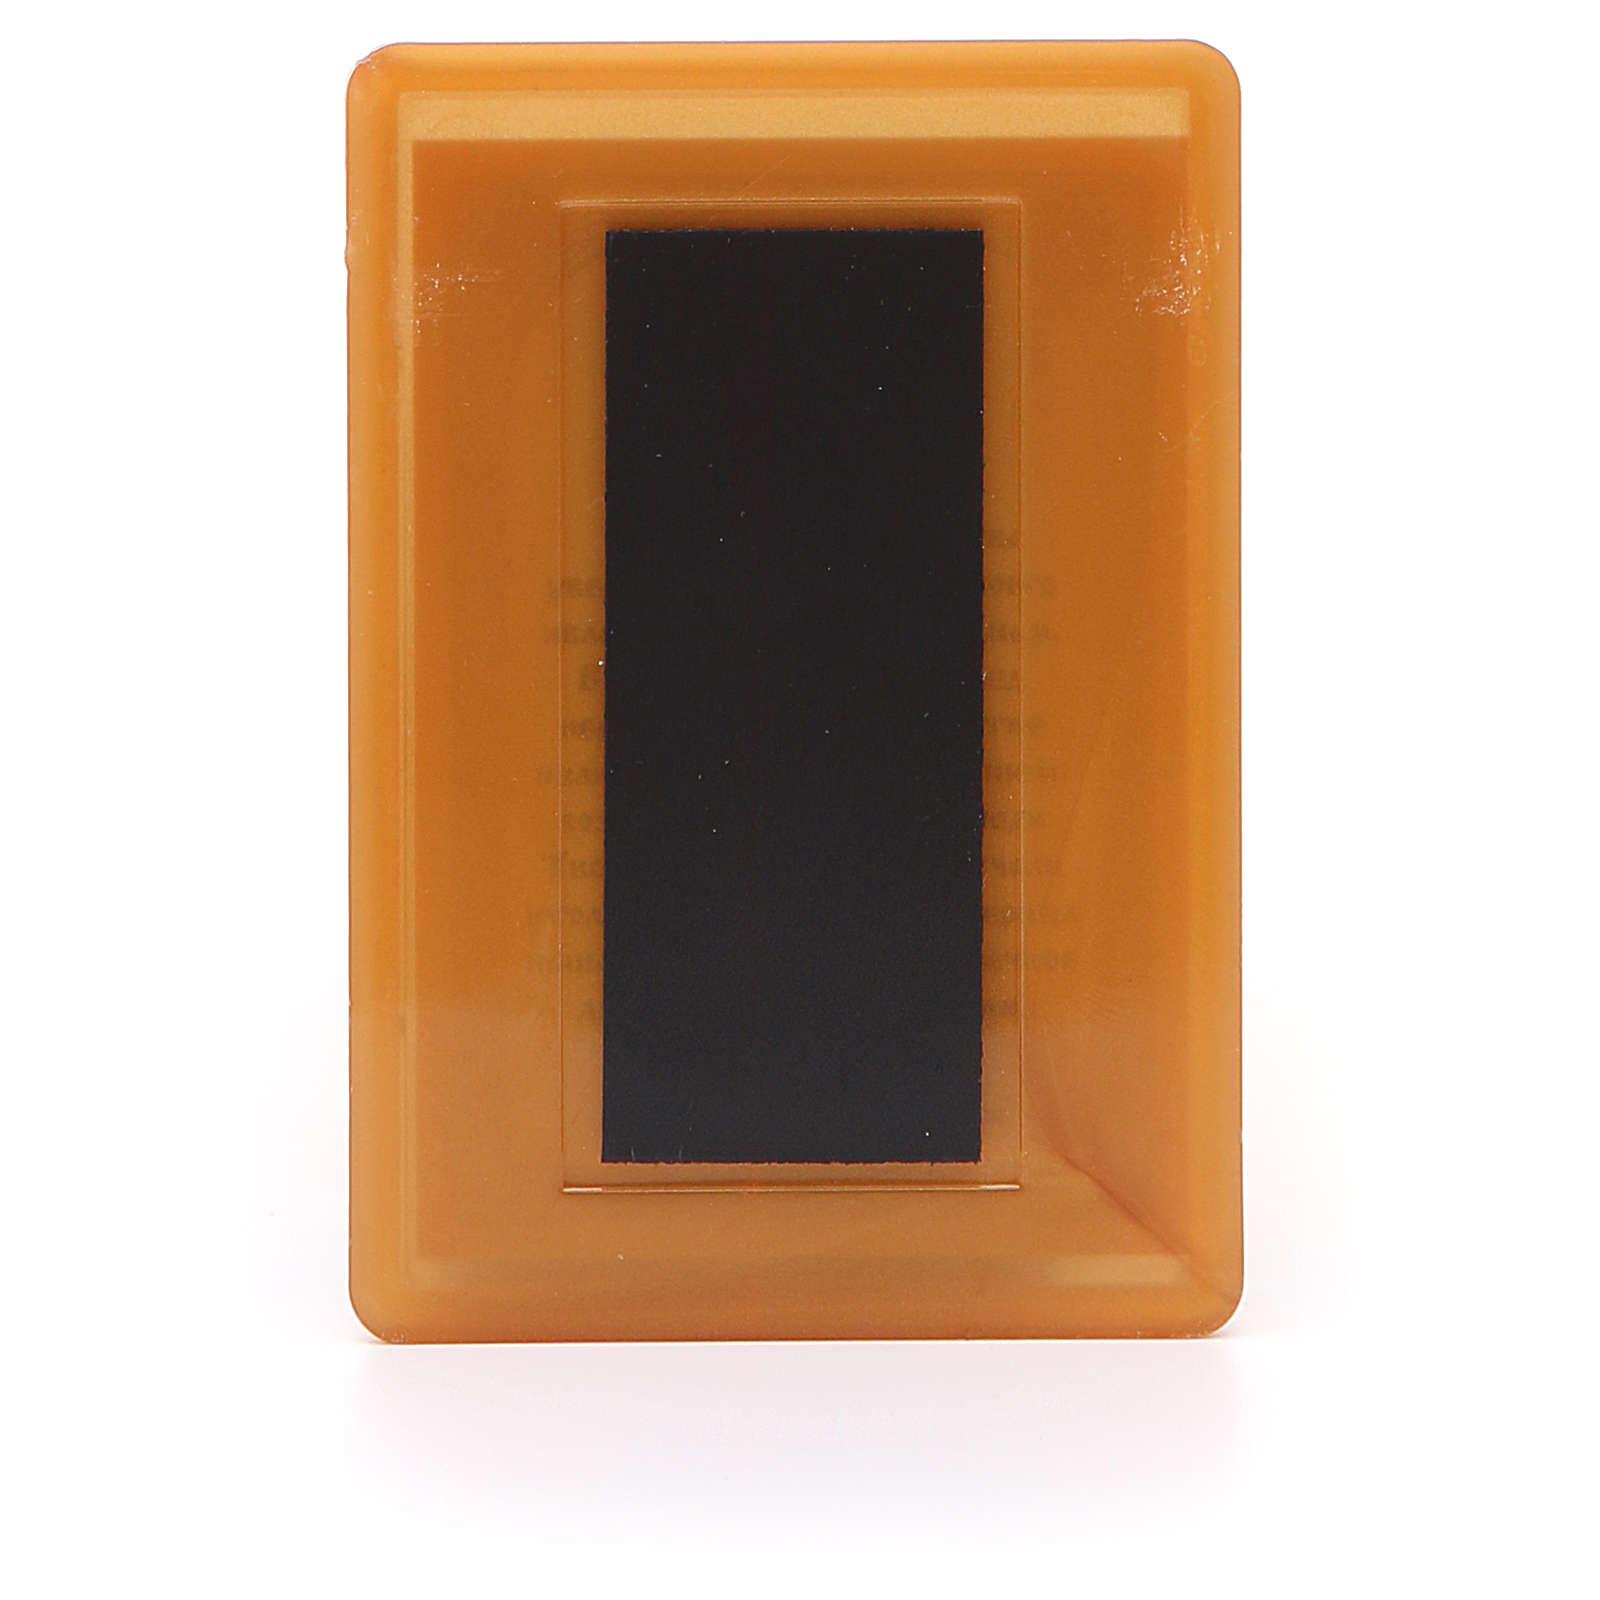 Aimant plexiglas Russie Ozeranskaya 10x7 cm 3